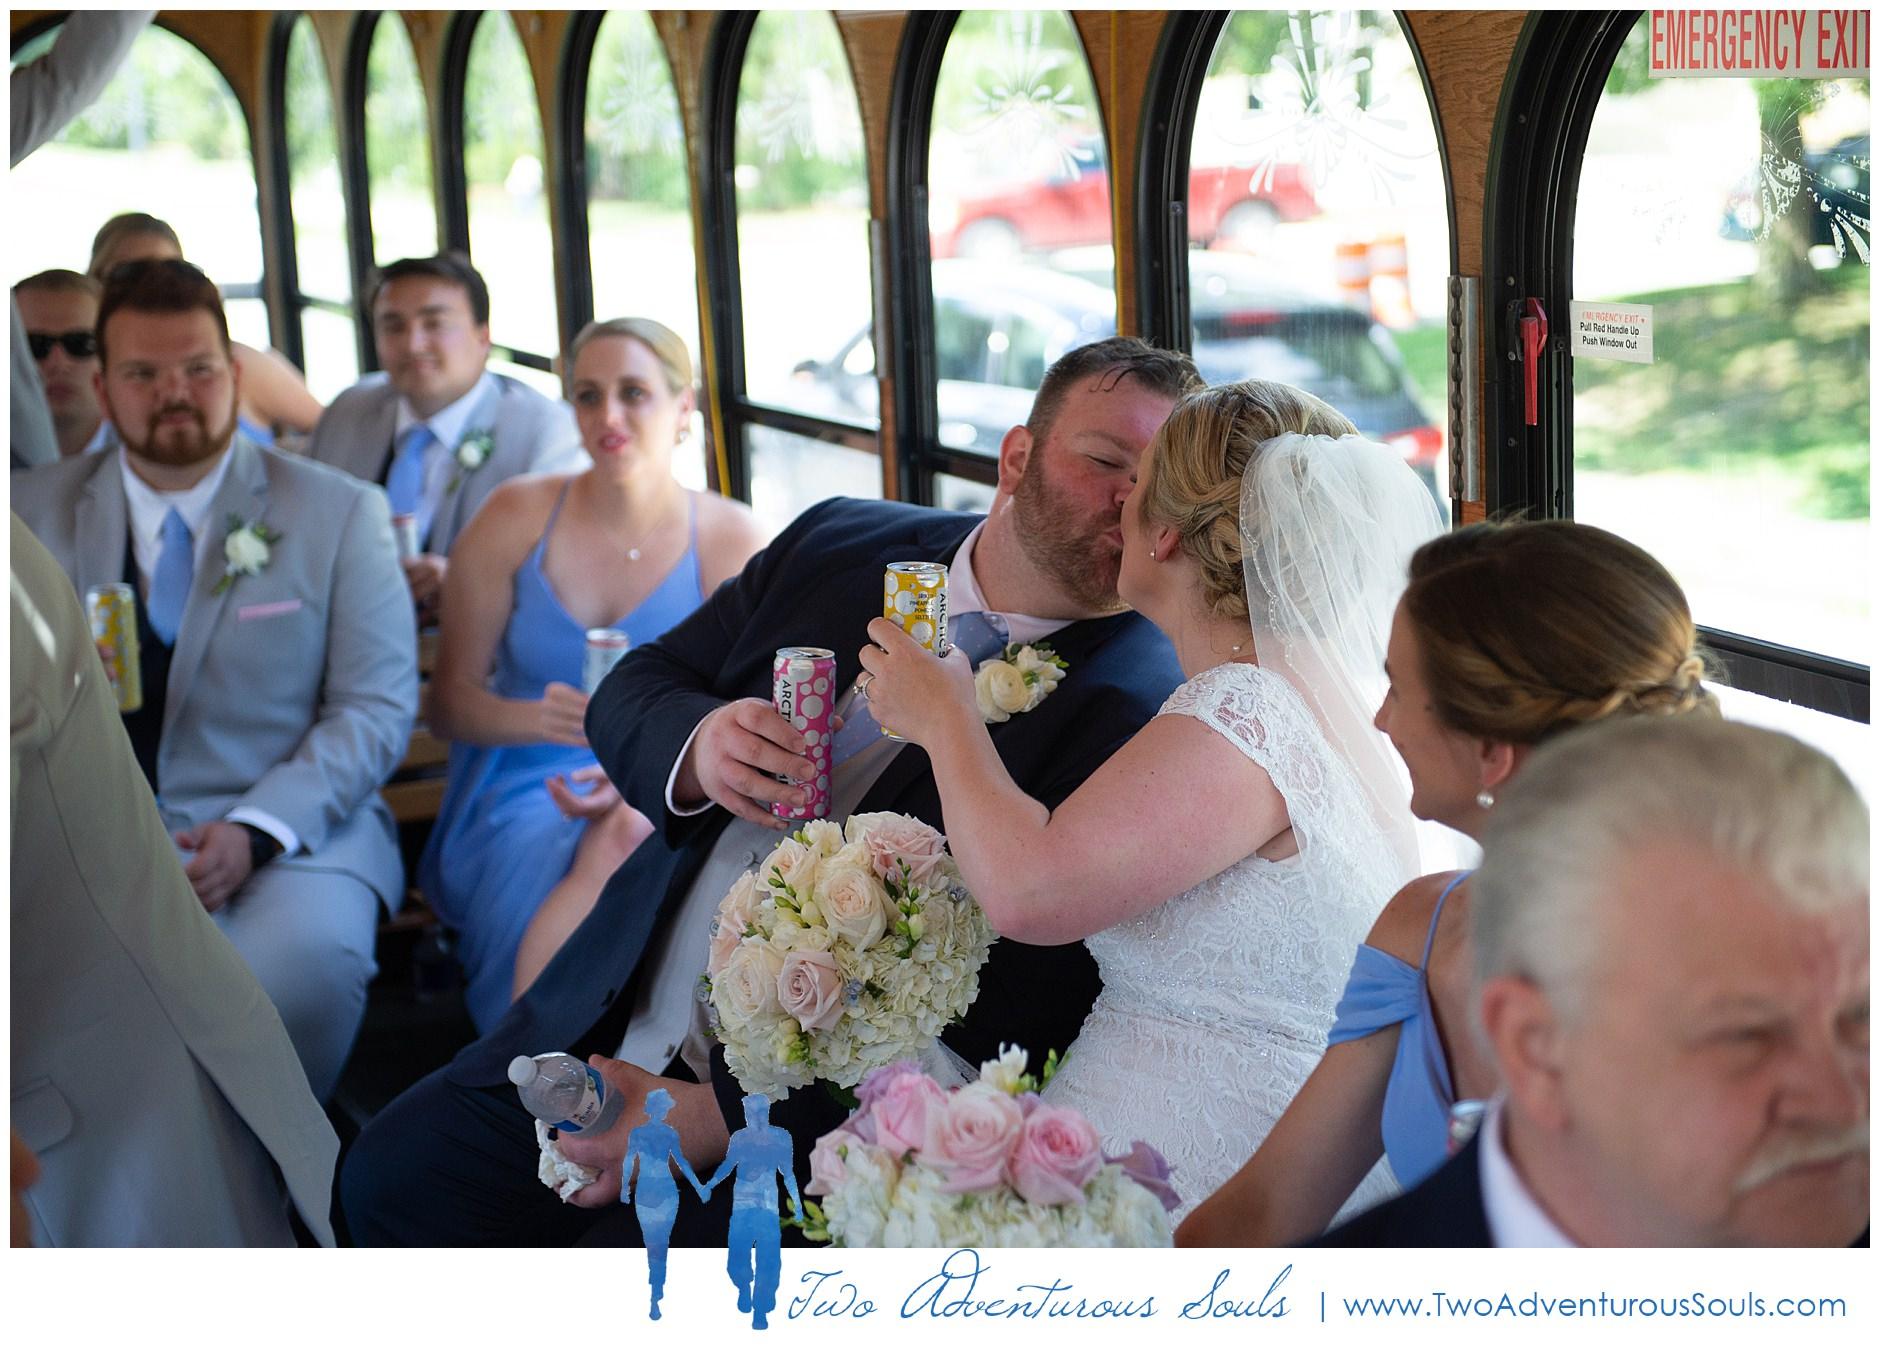 Cape Cod Wedding Photographers, Destination Wedding Photographers, Two Adventurous Souls-081019_0027.jpg